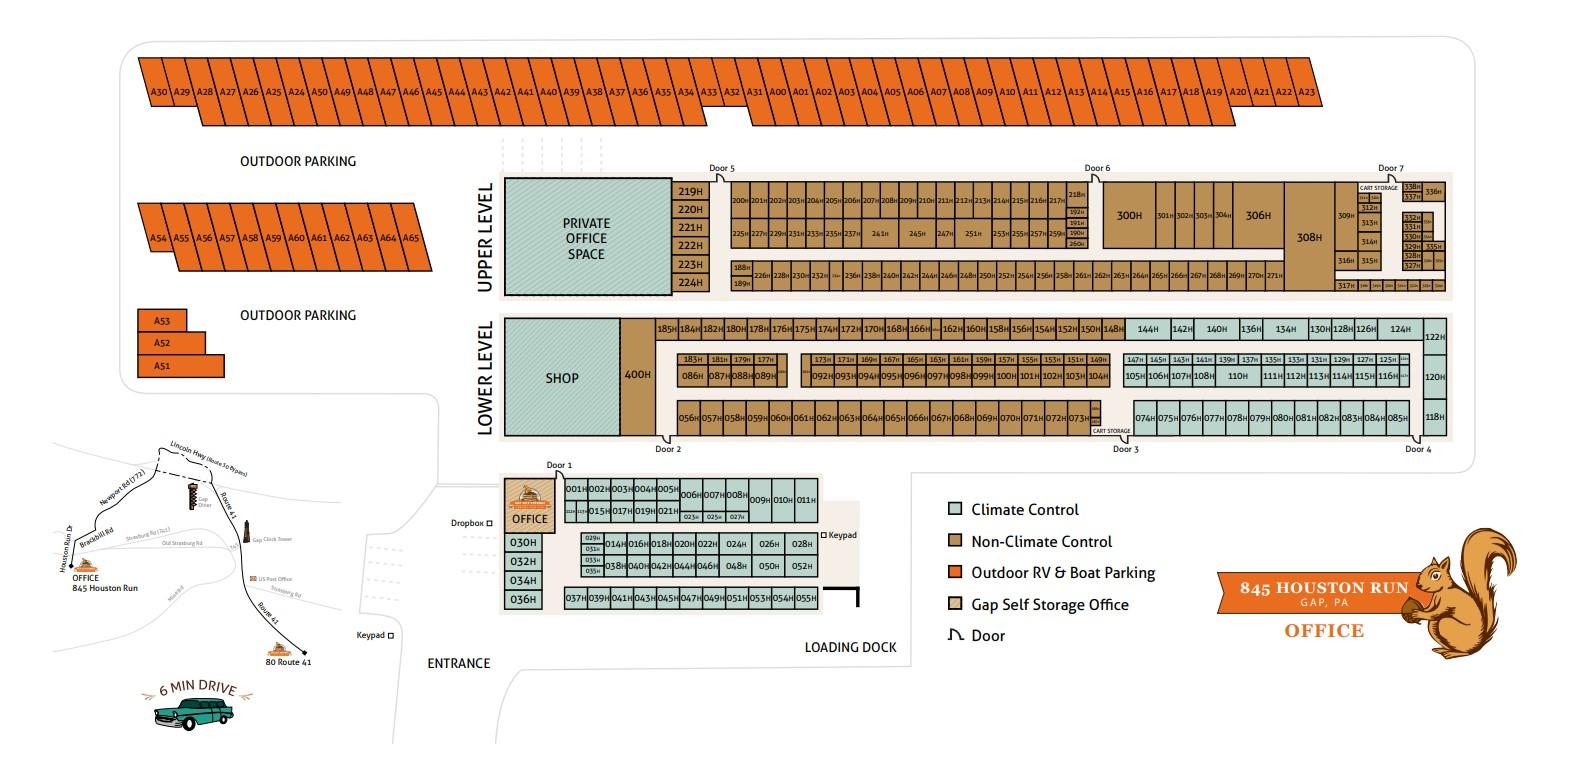 facility map - houston run